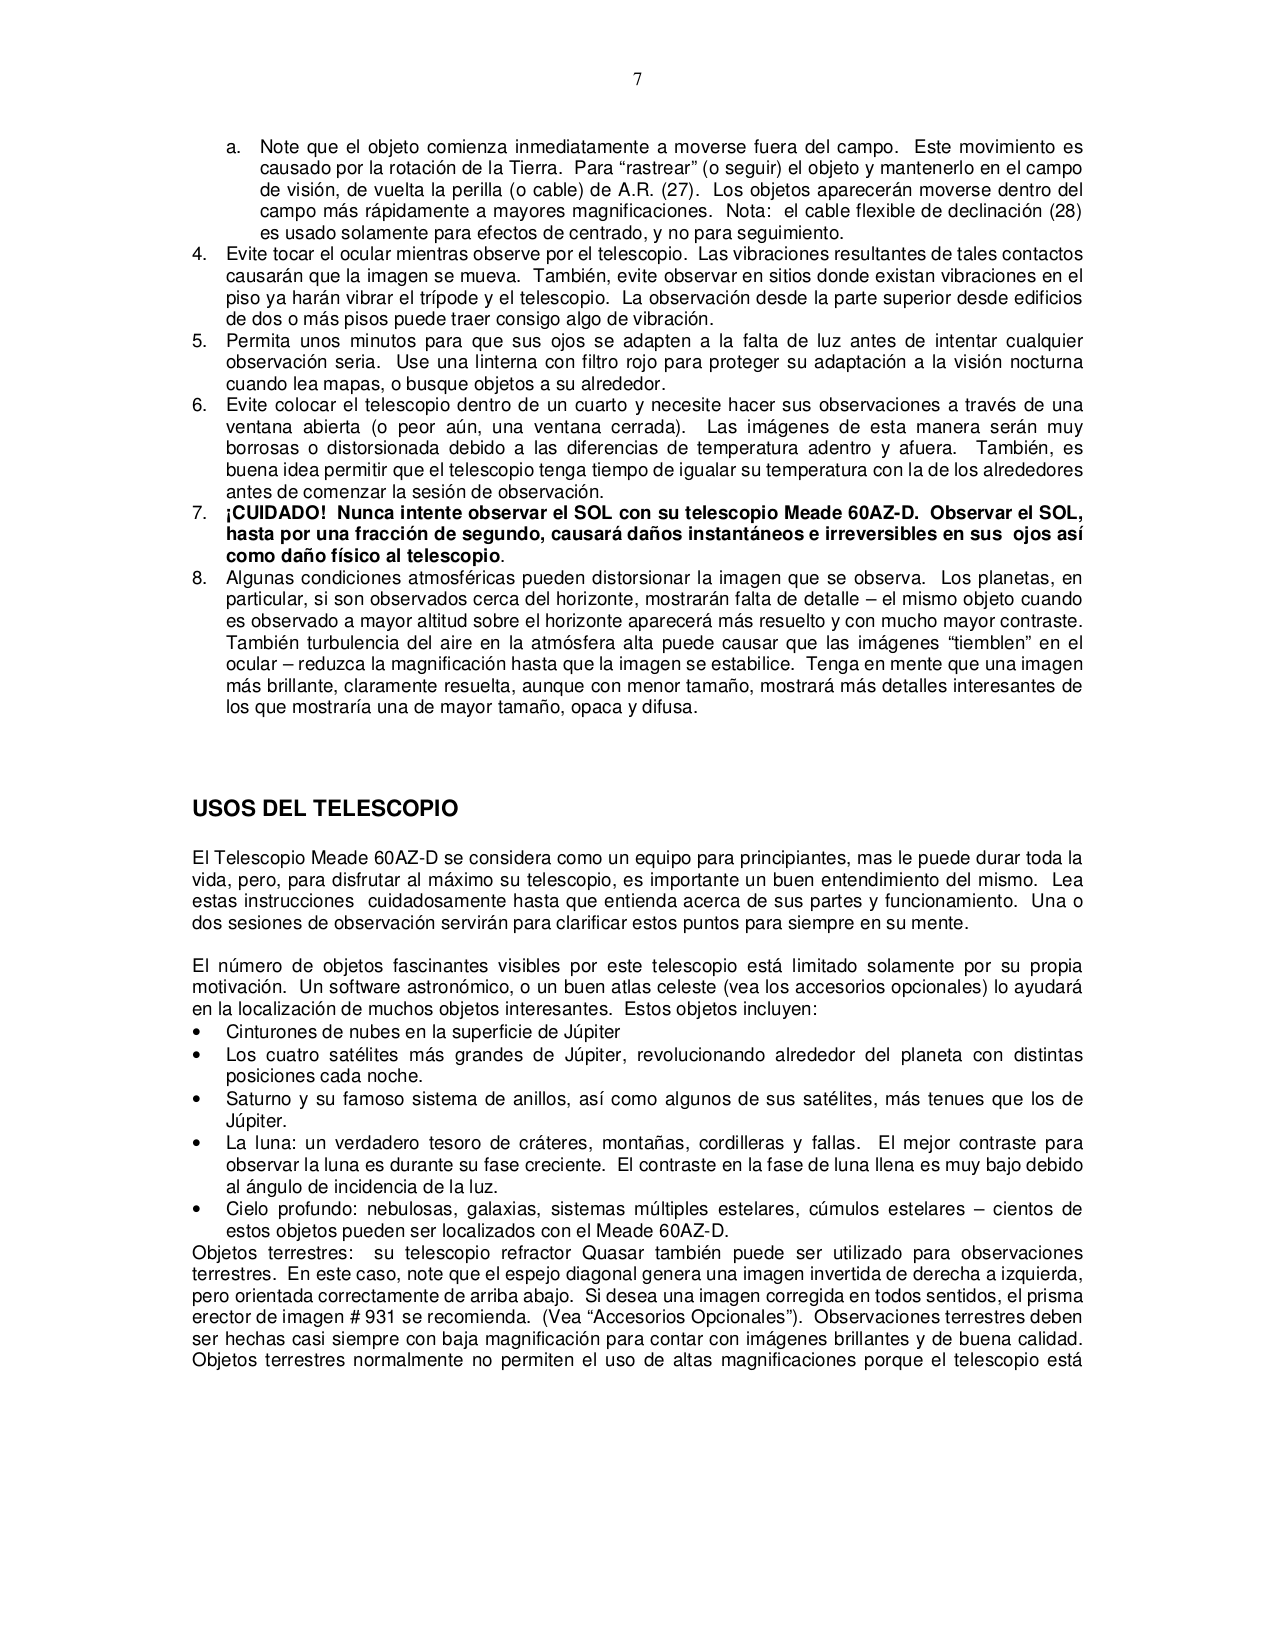 polaris by meade telescope manual